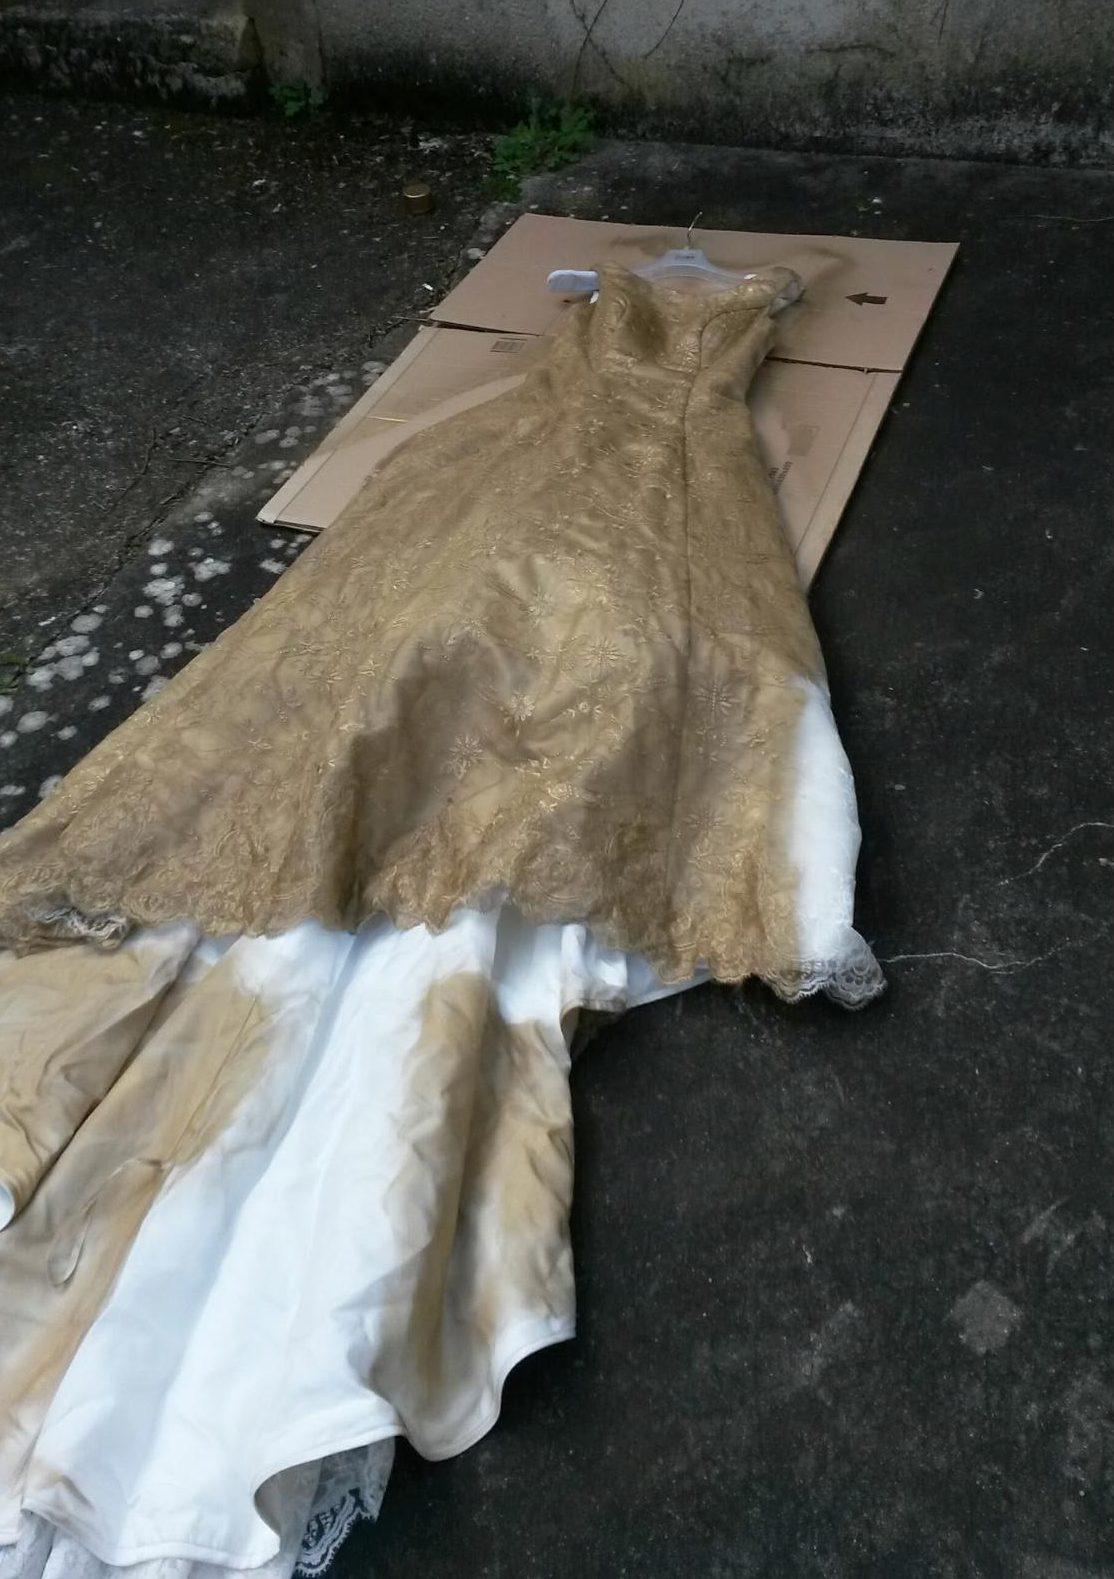 dress partially sprayed